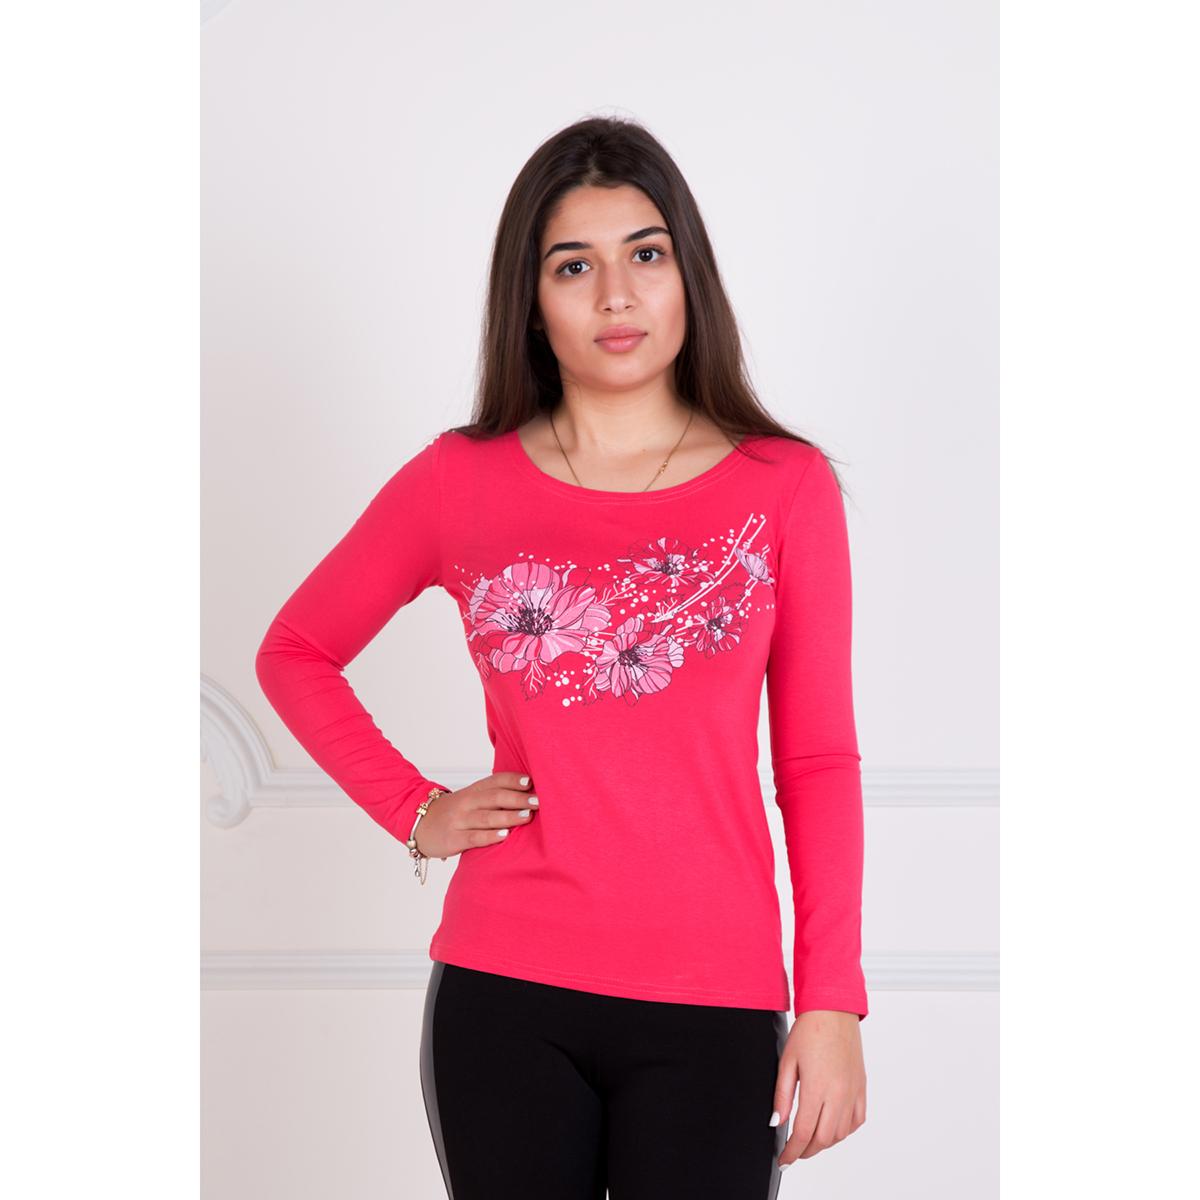 Женская блуза Анетта, размер 46Блузки, майки, кофты<br>Обхват груди:92 см<br>Обхват талии:74 см<br>Обхват бедер:100 см<br>Рост:167 см<br><br>Тип: Жен. блуза<br>Размер: 46<br>Материал: Вискоза